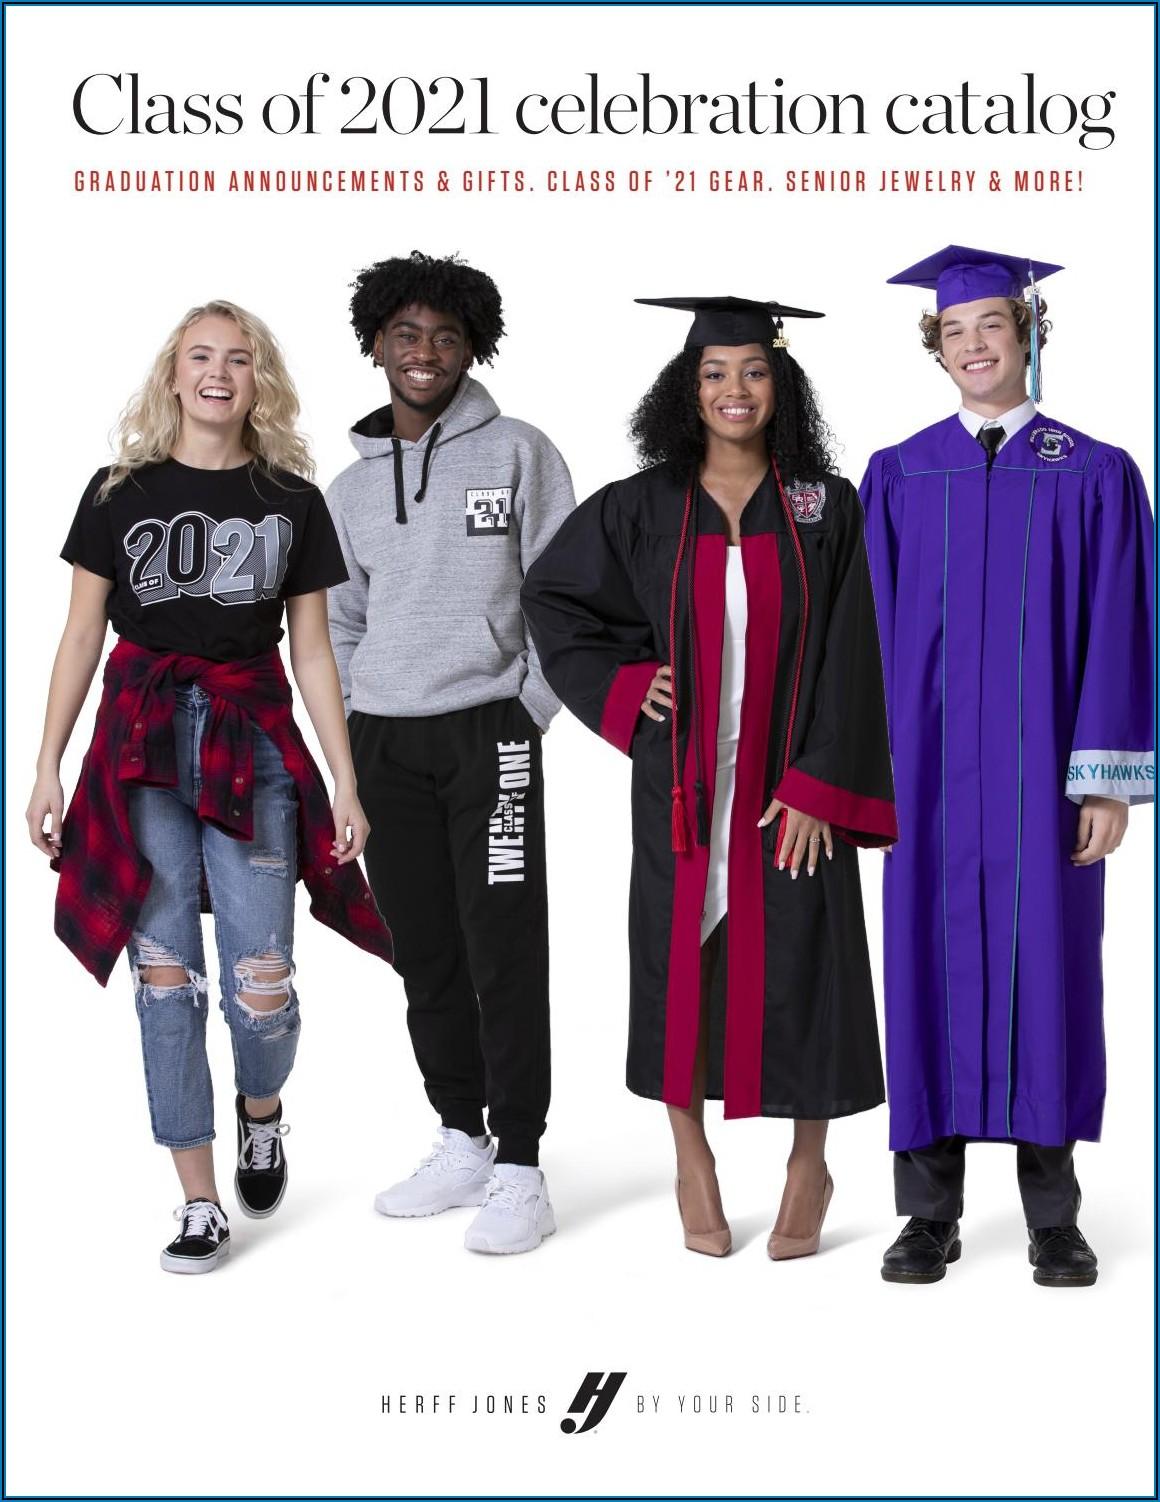 Herff Jones Graduation Announcement Size